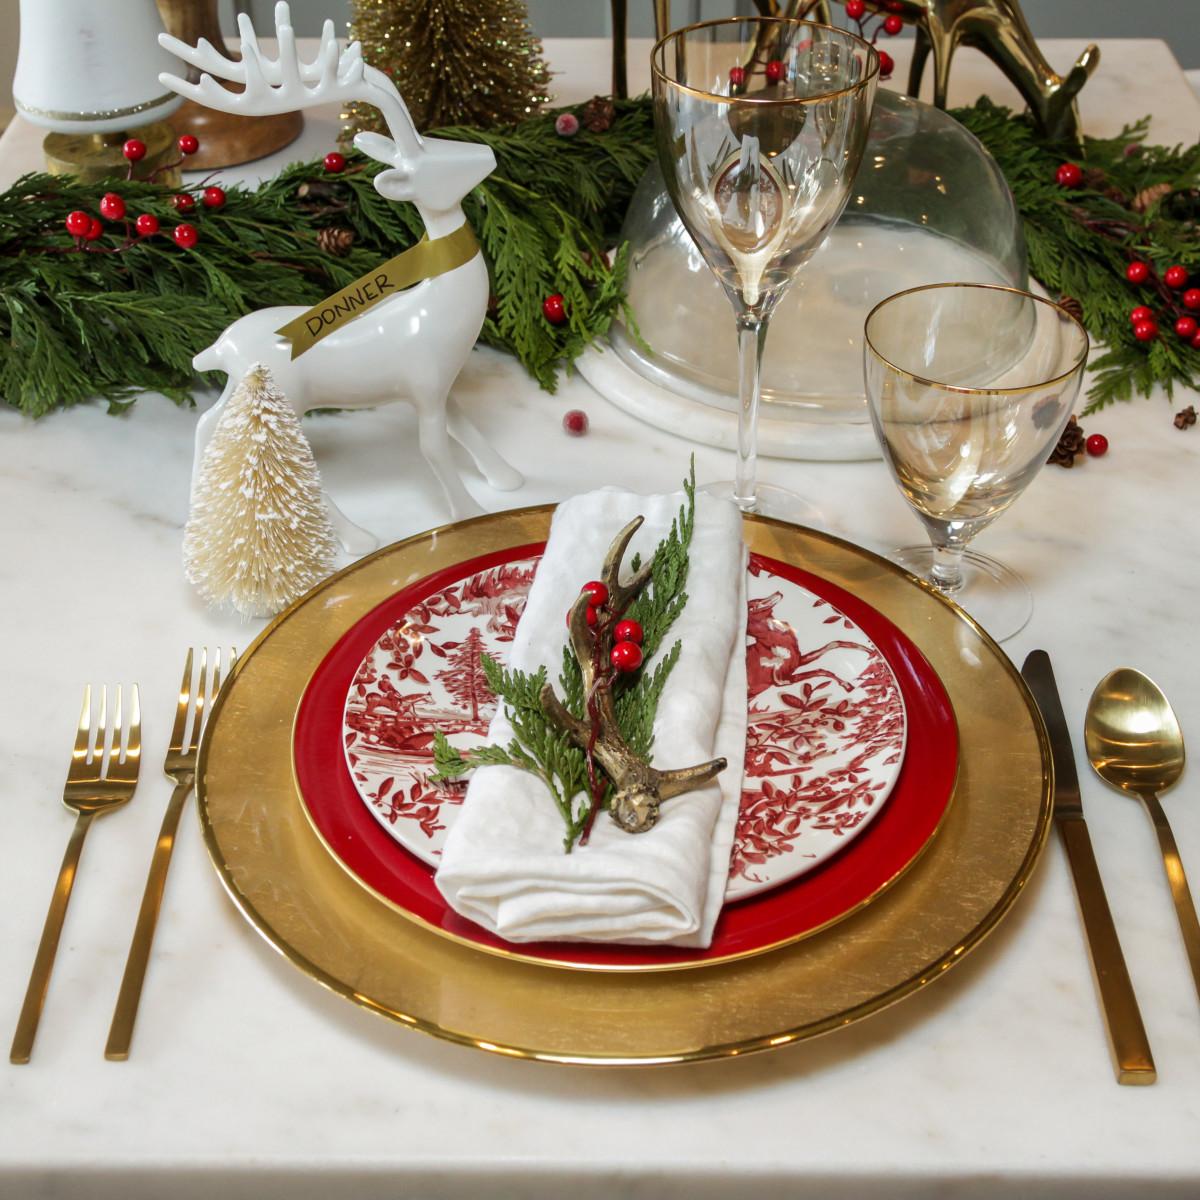 News, Houston Design Center, Deck the Tables, Dec. 2015 Osbourne Cabinets